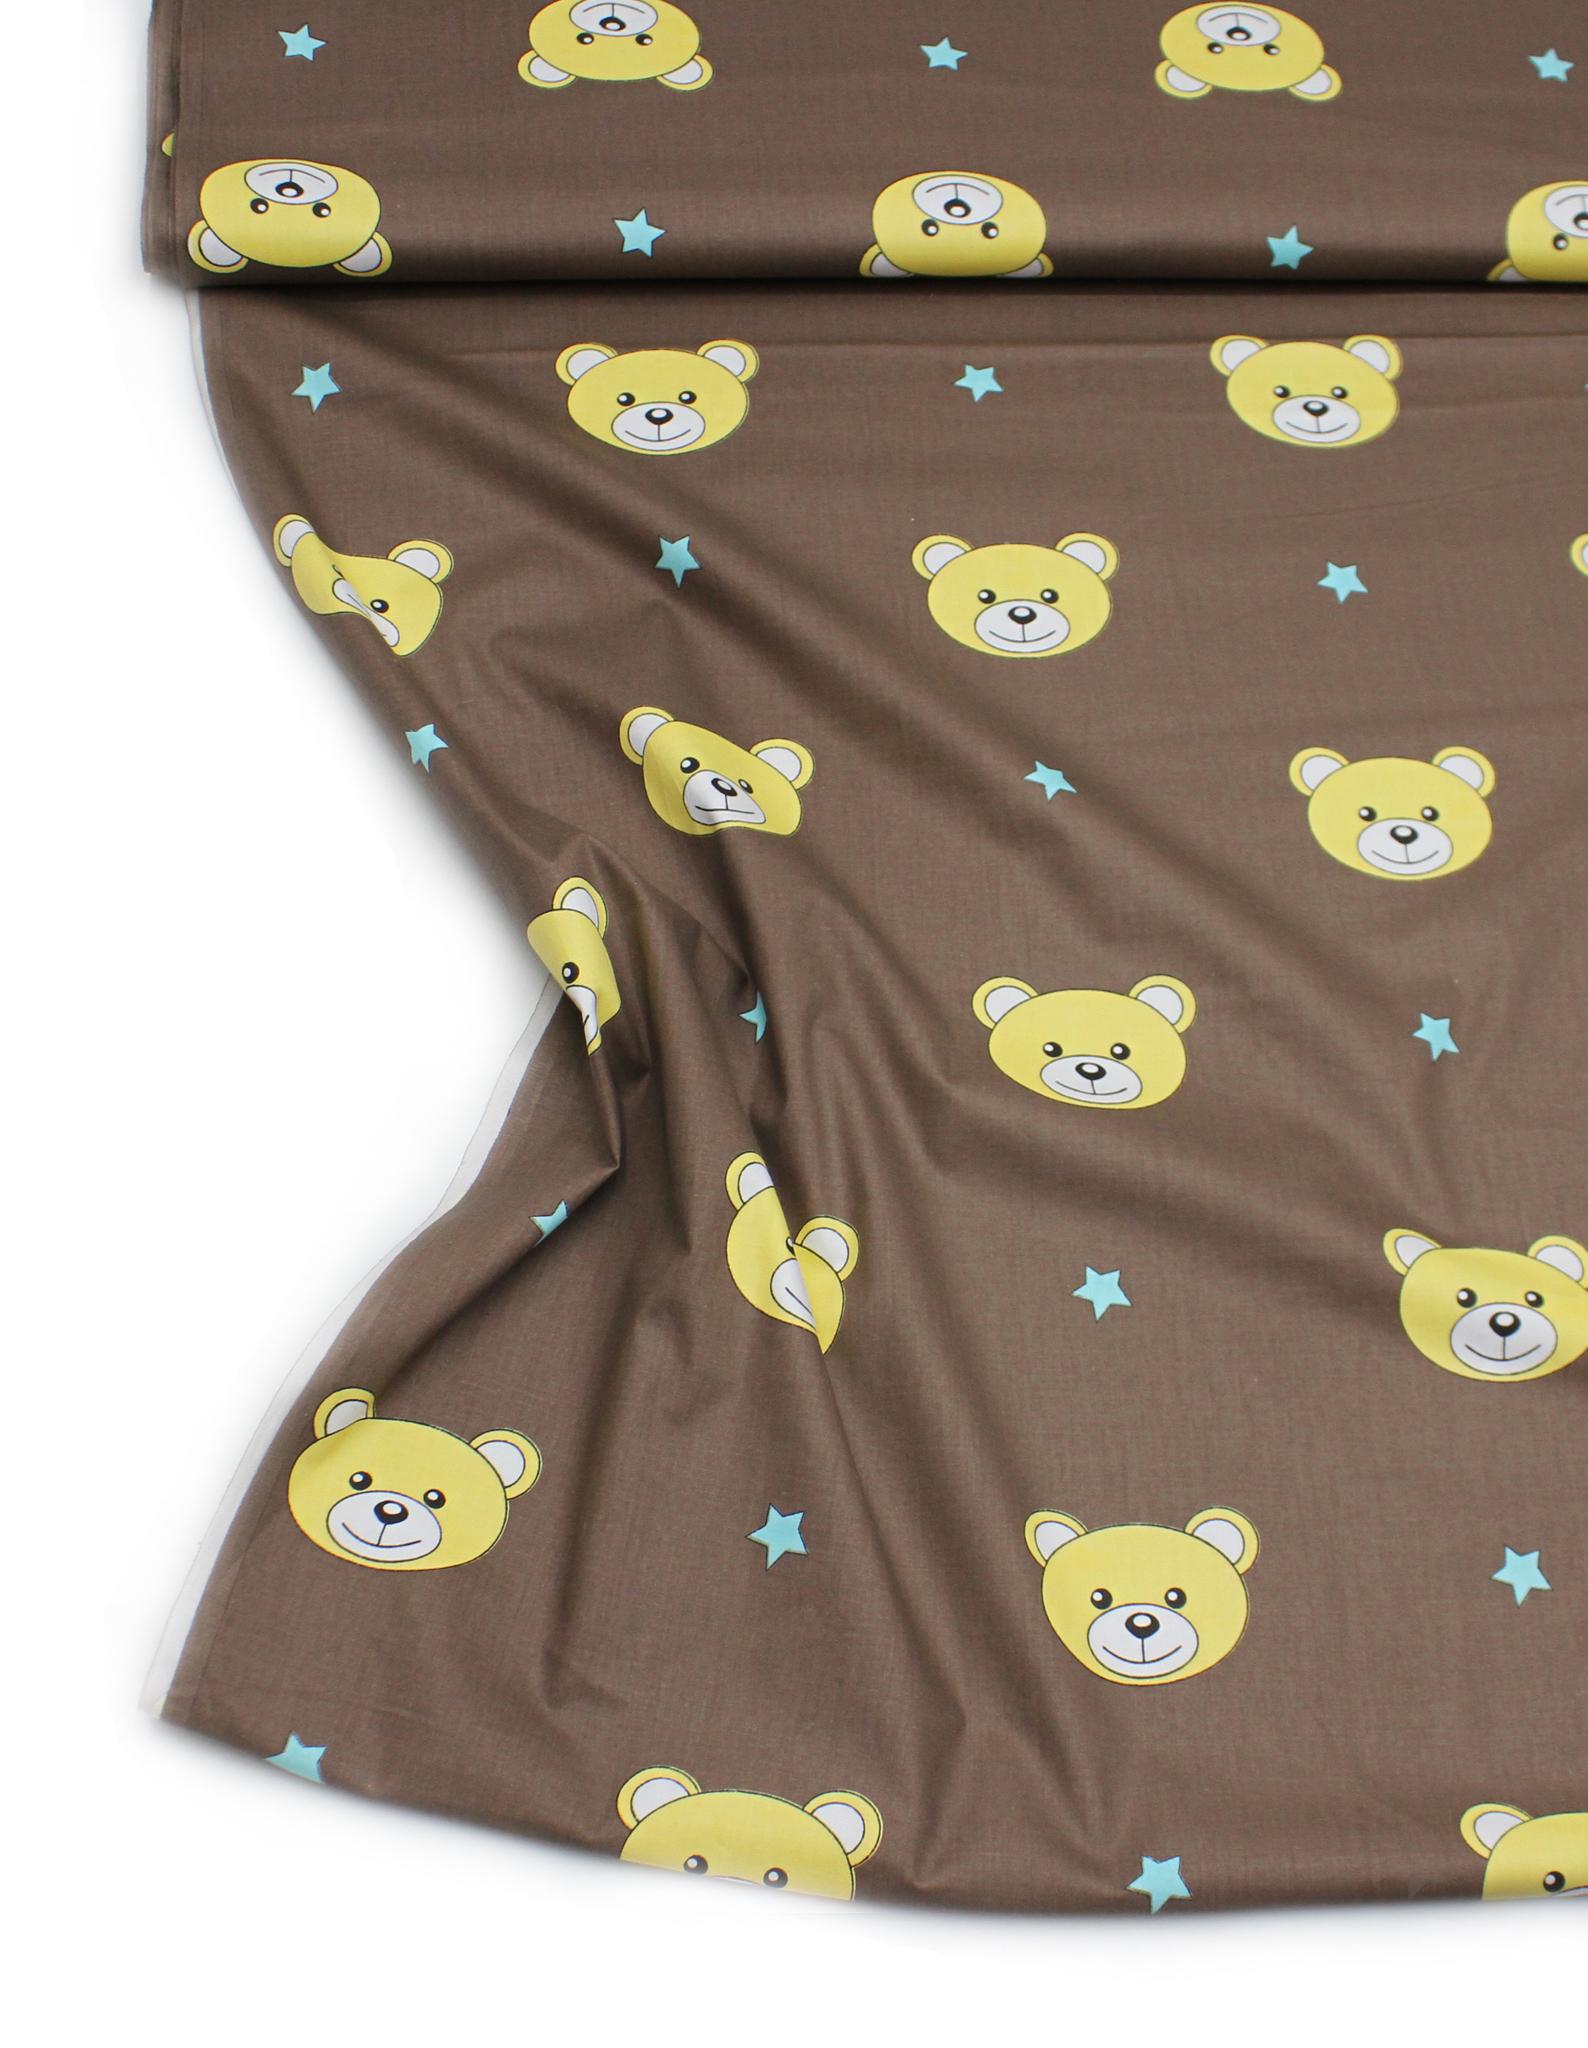 Медвежата шоколадные